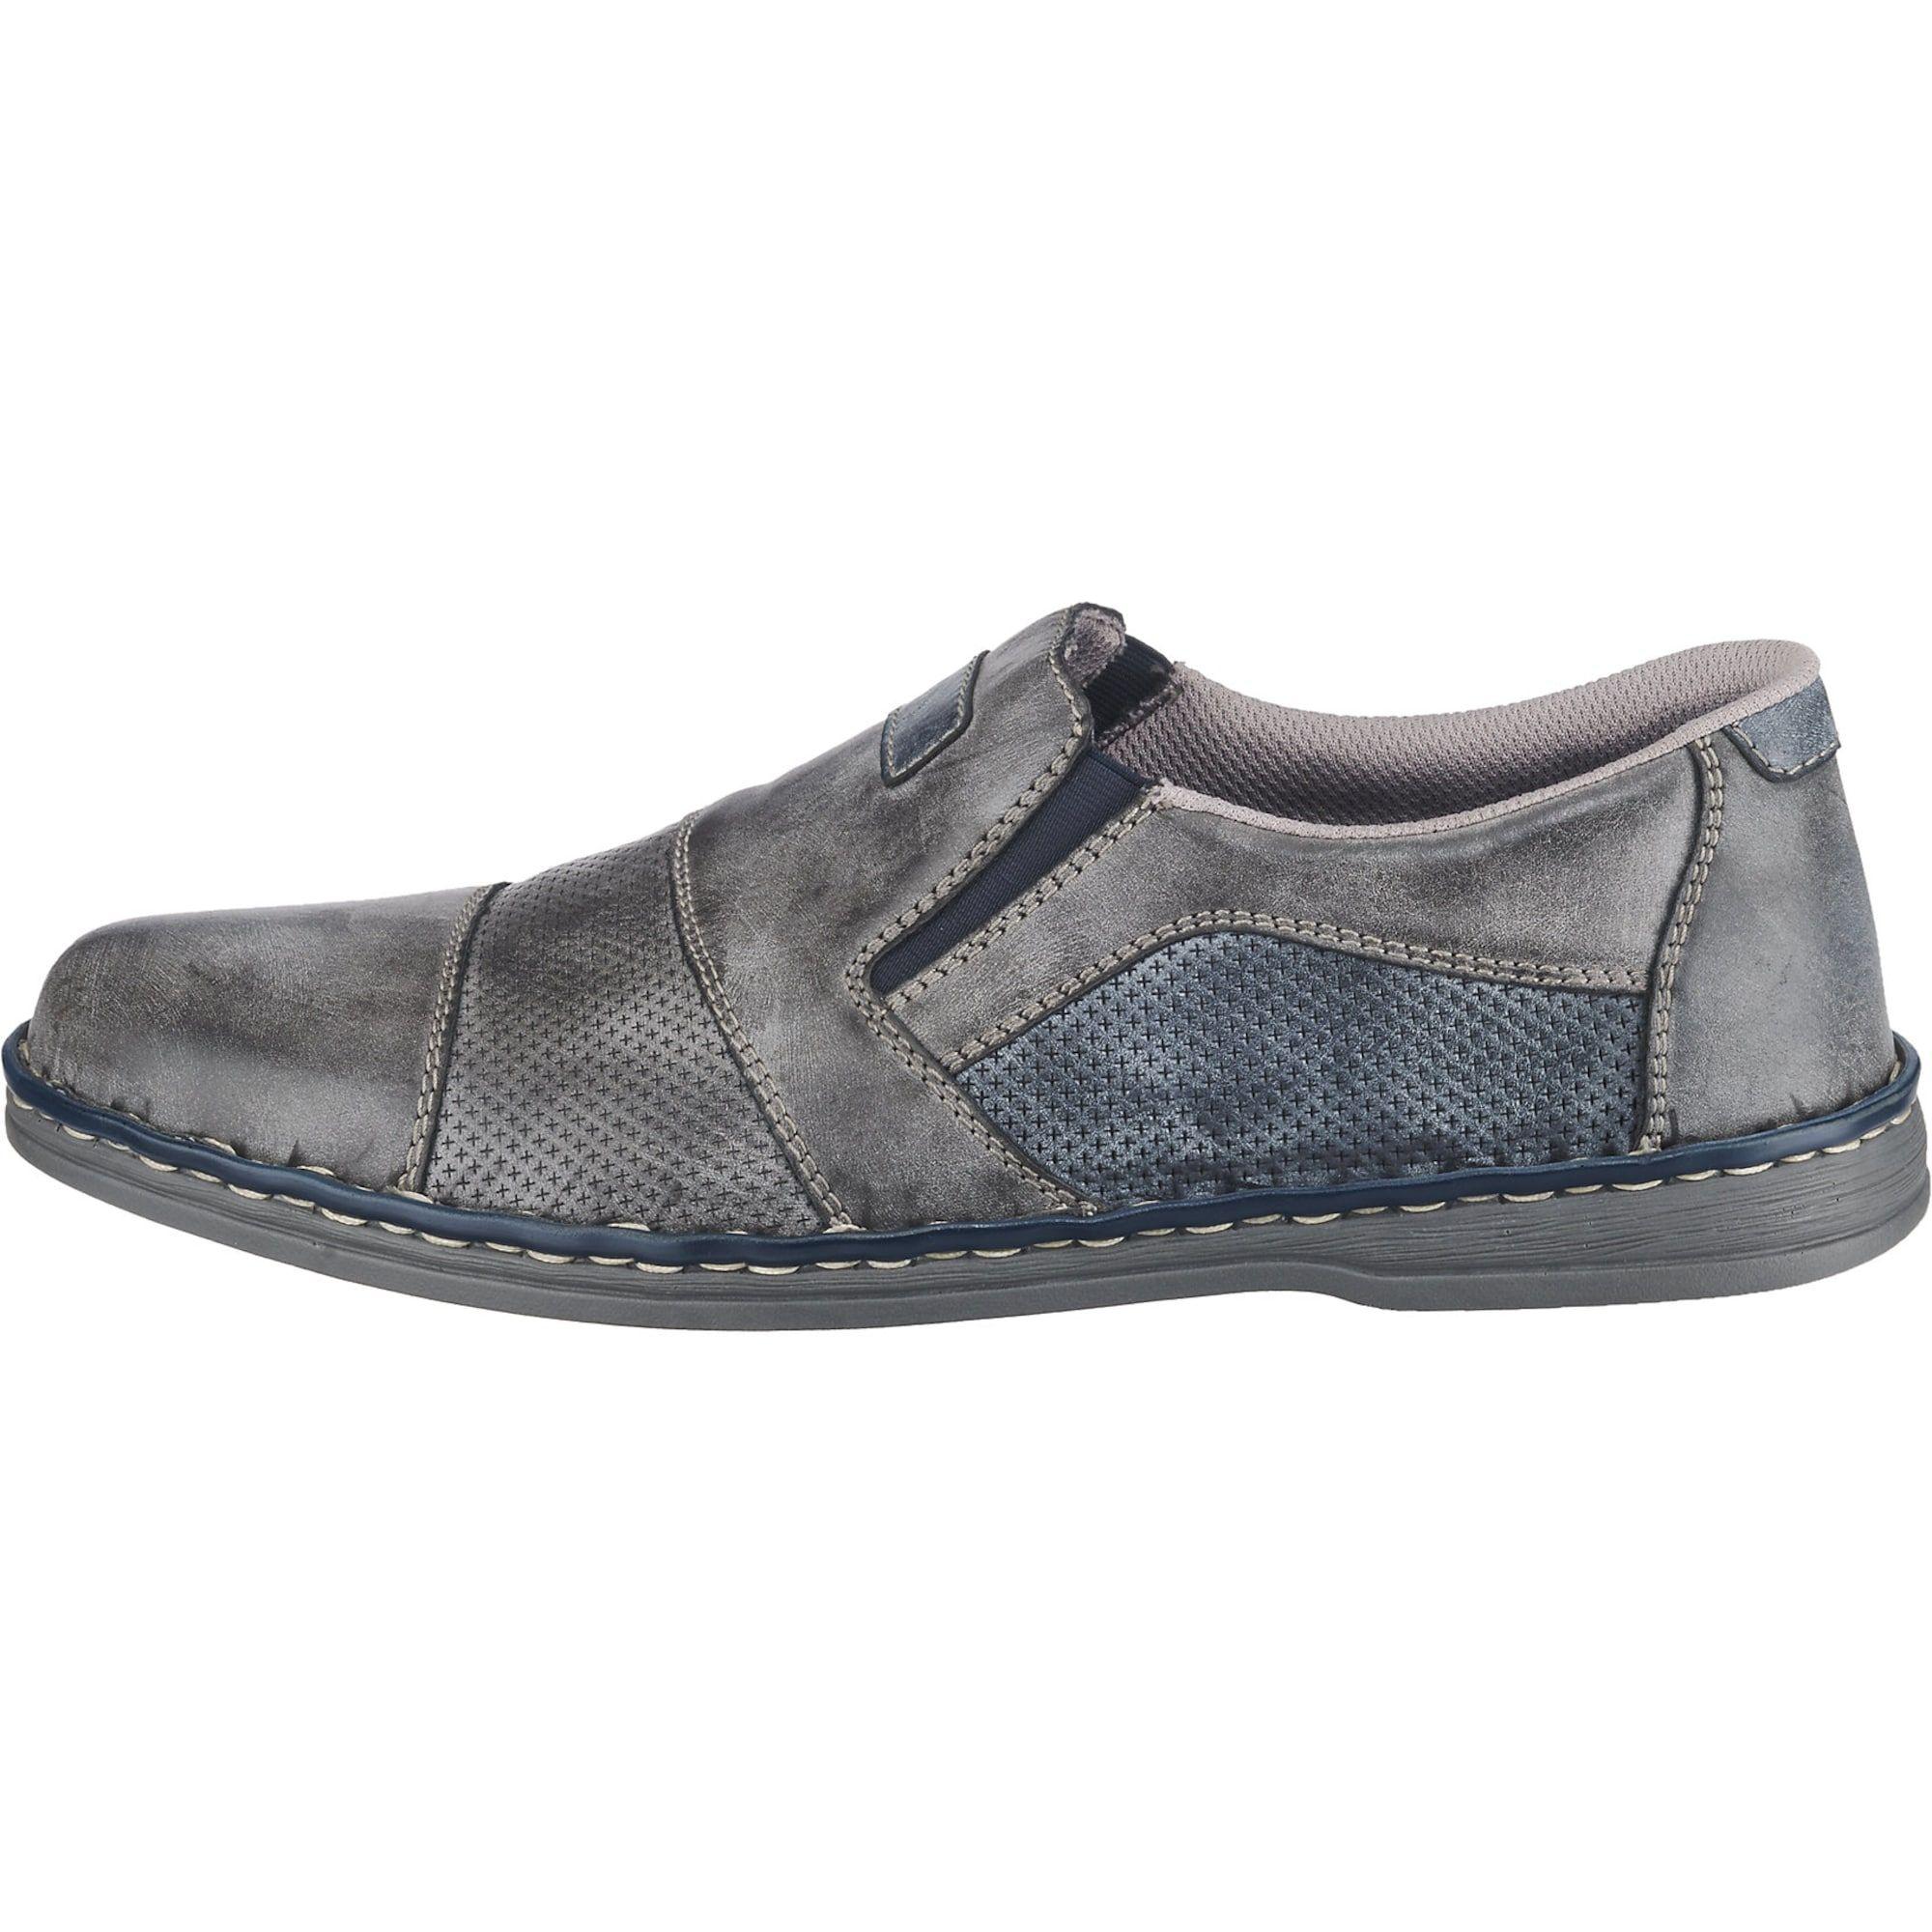 RIEKER Slipper Herren, Taubenblau Grau, Größe 45 | Slipper